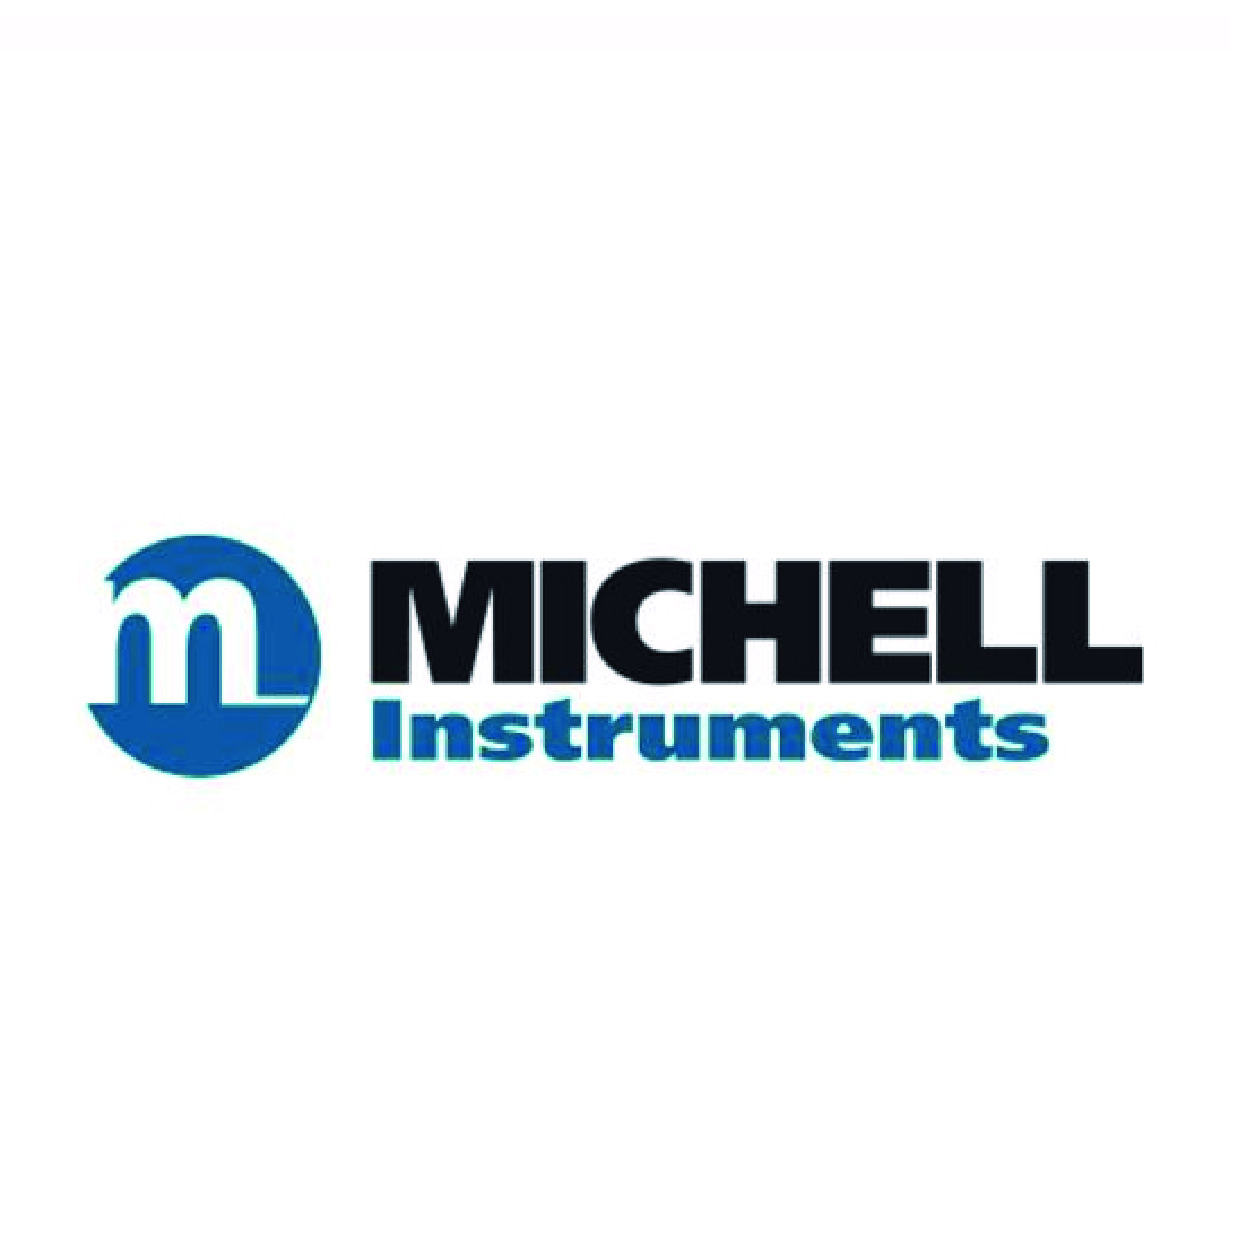 logo-michell-instrument-exposant-salon-forumesure-2019_Plan de travail 1_Plan de travail 1